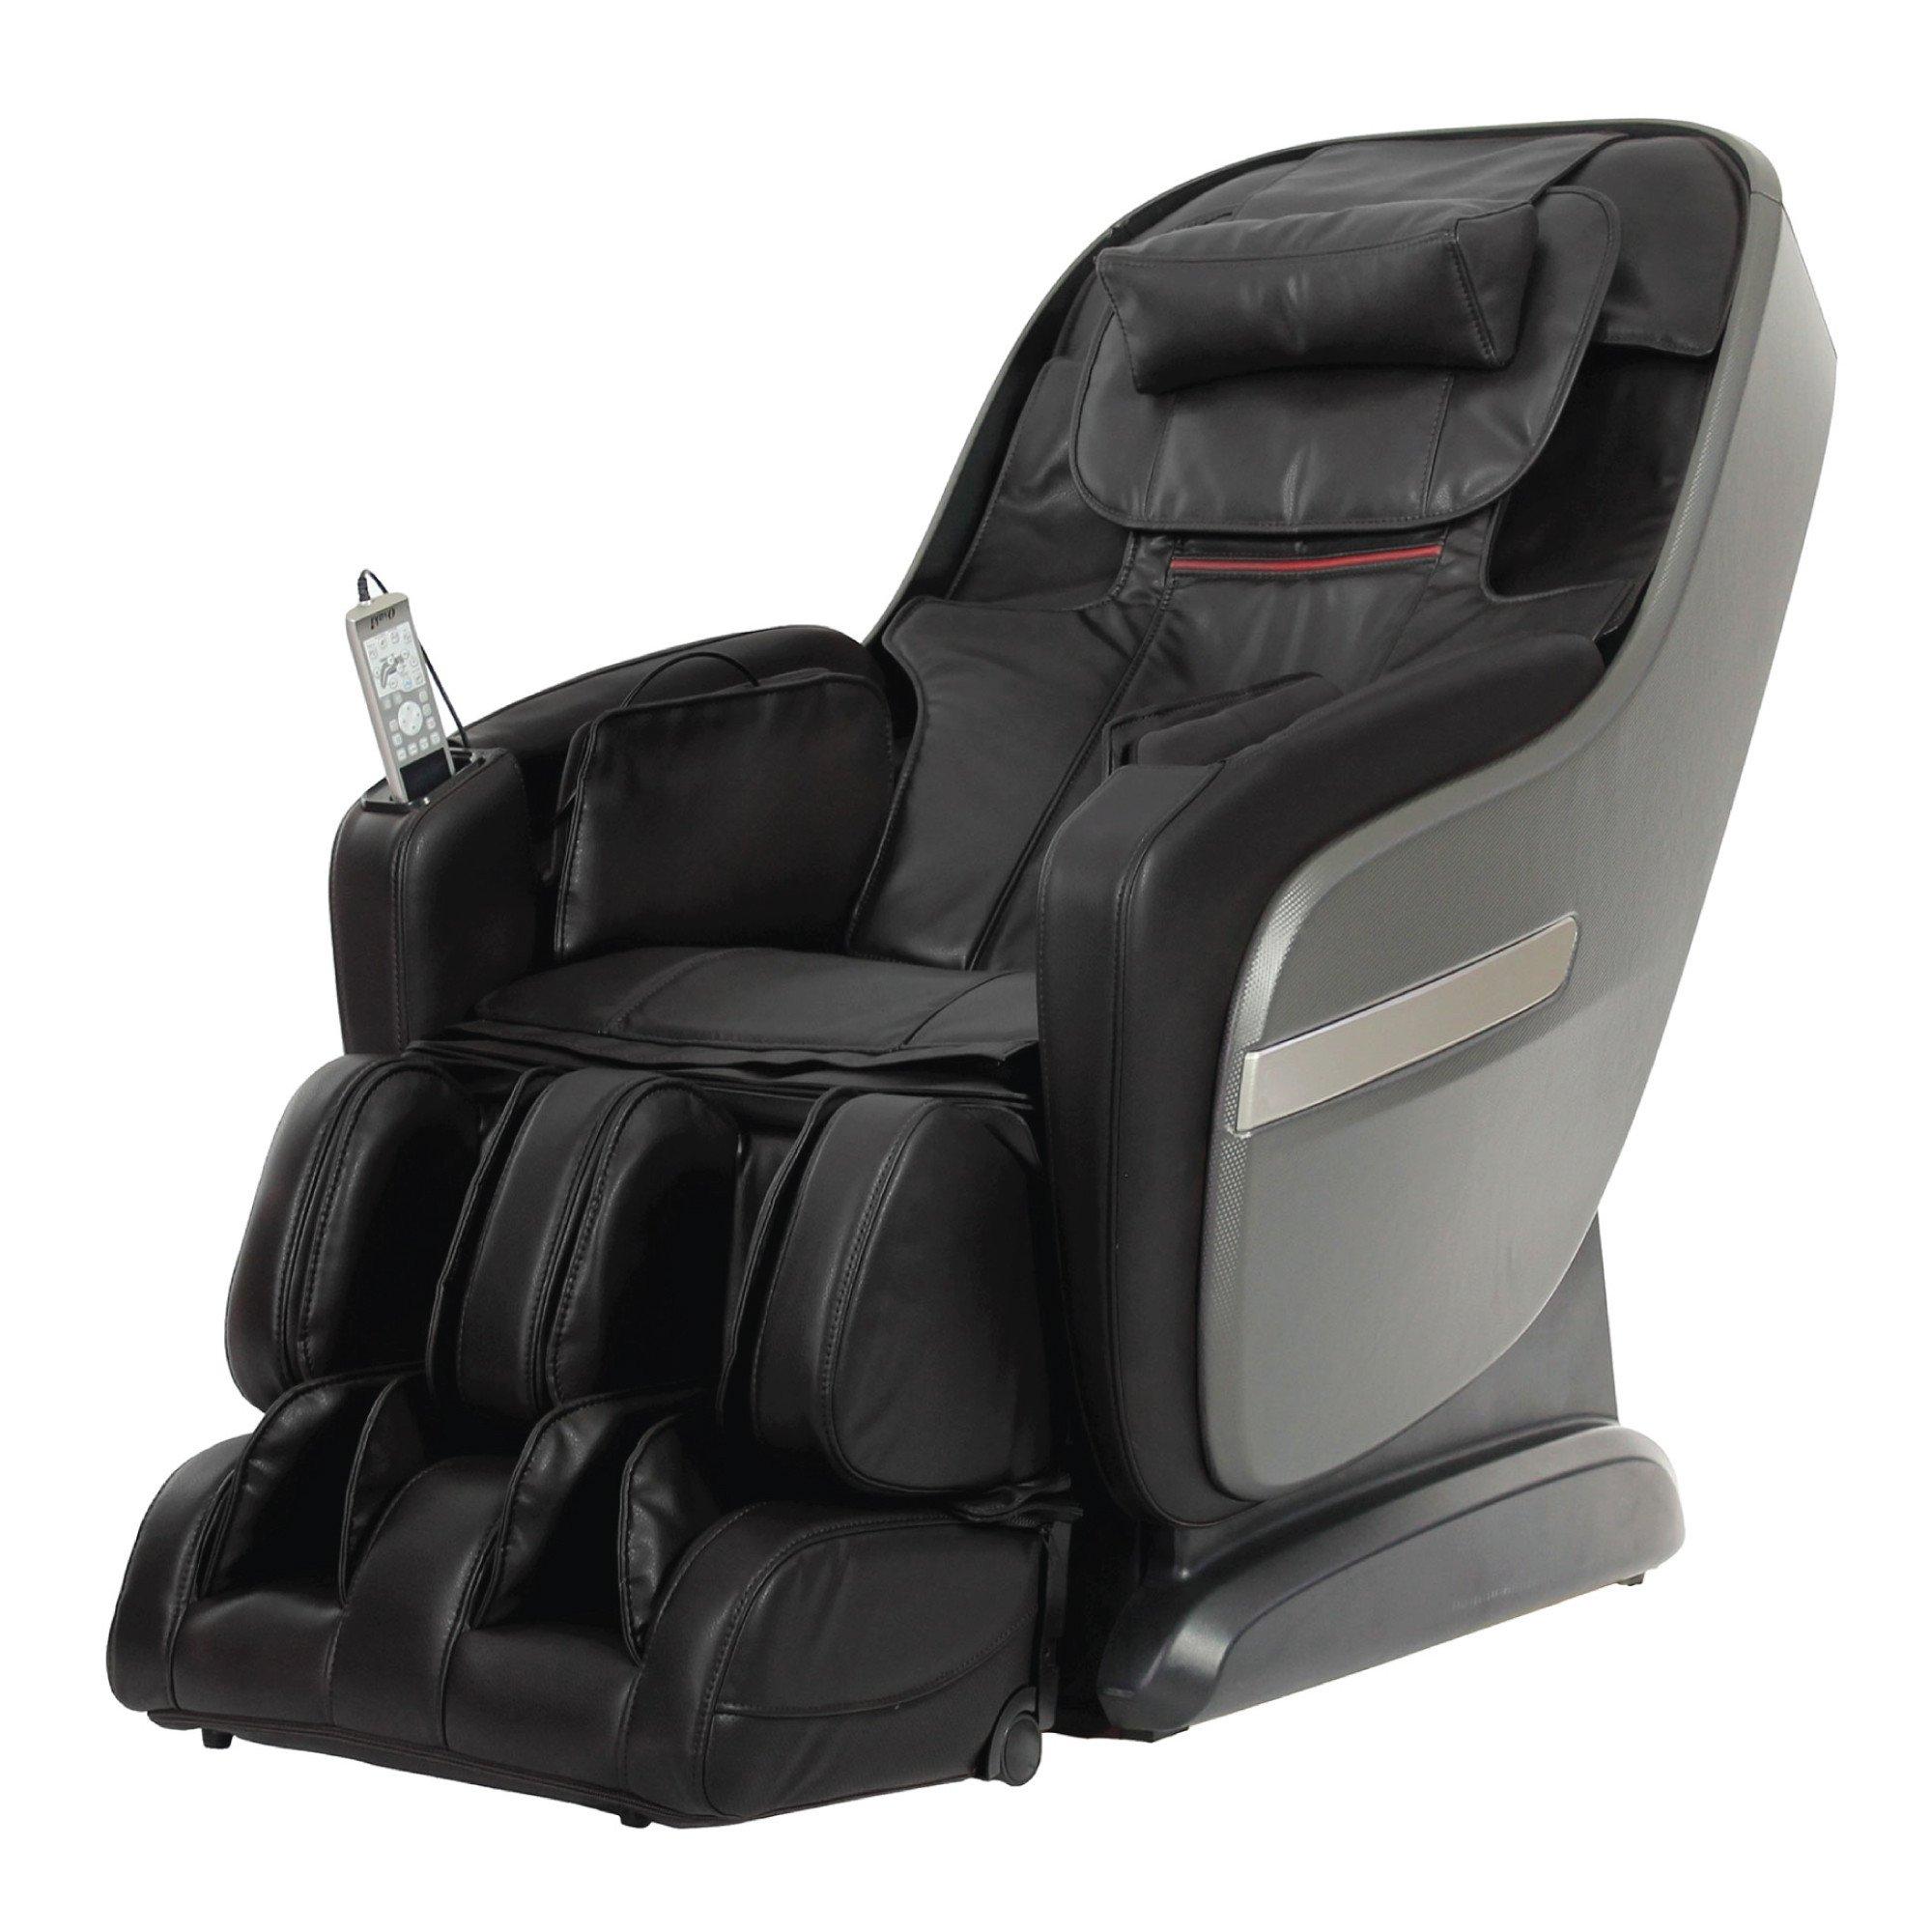 Titan Alpine Massage Chair - Black - Front Angle View